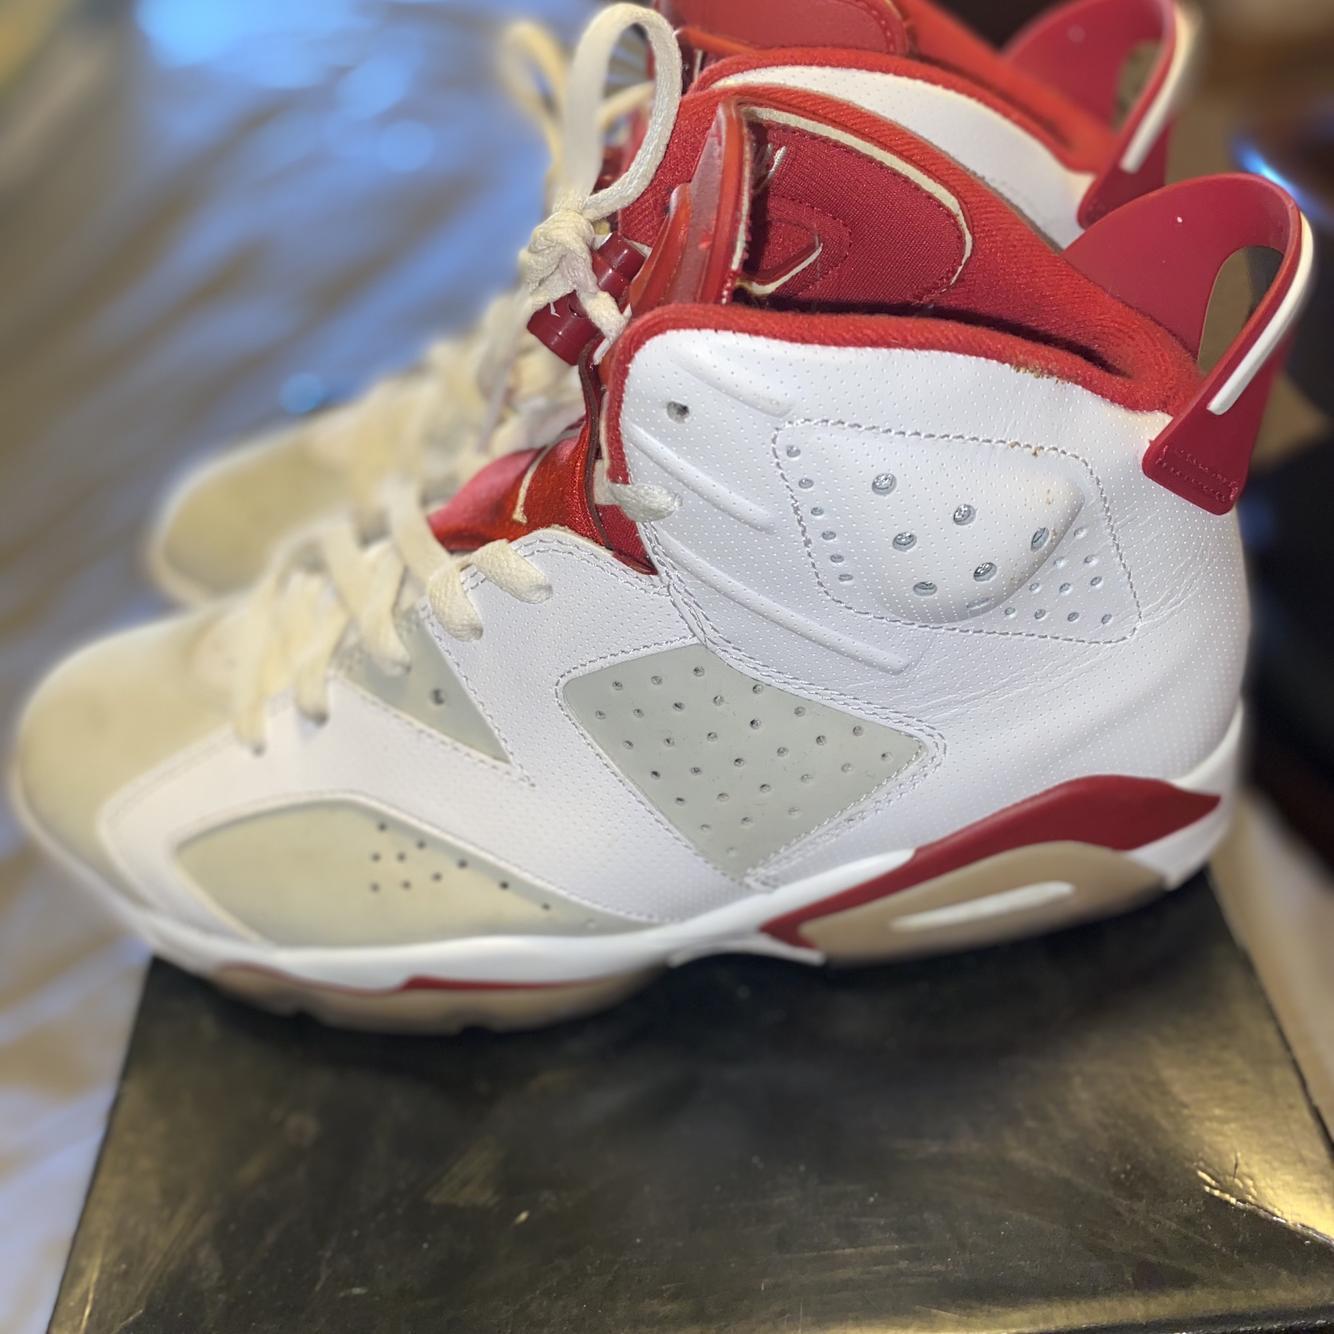 Air Jordan Gray Men's Size 8.5 (Women's